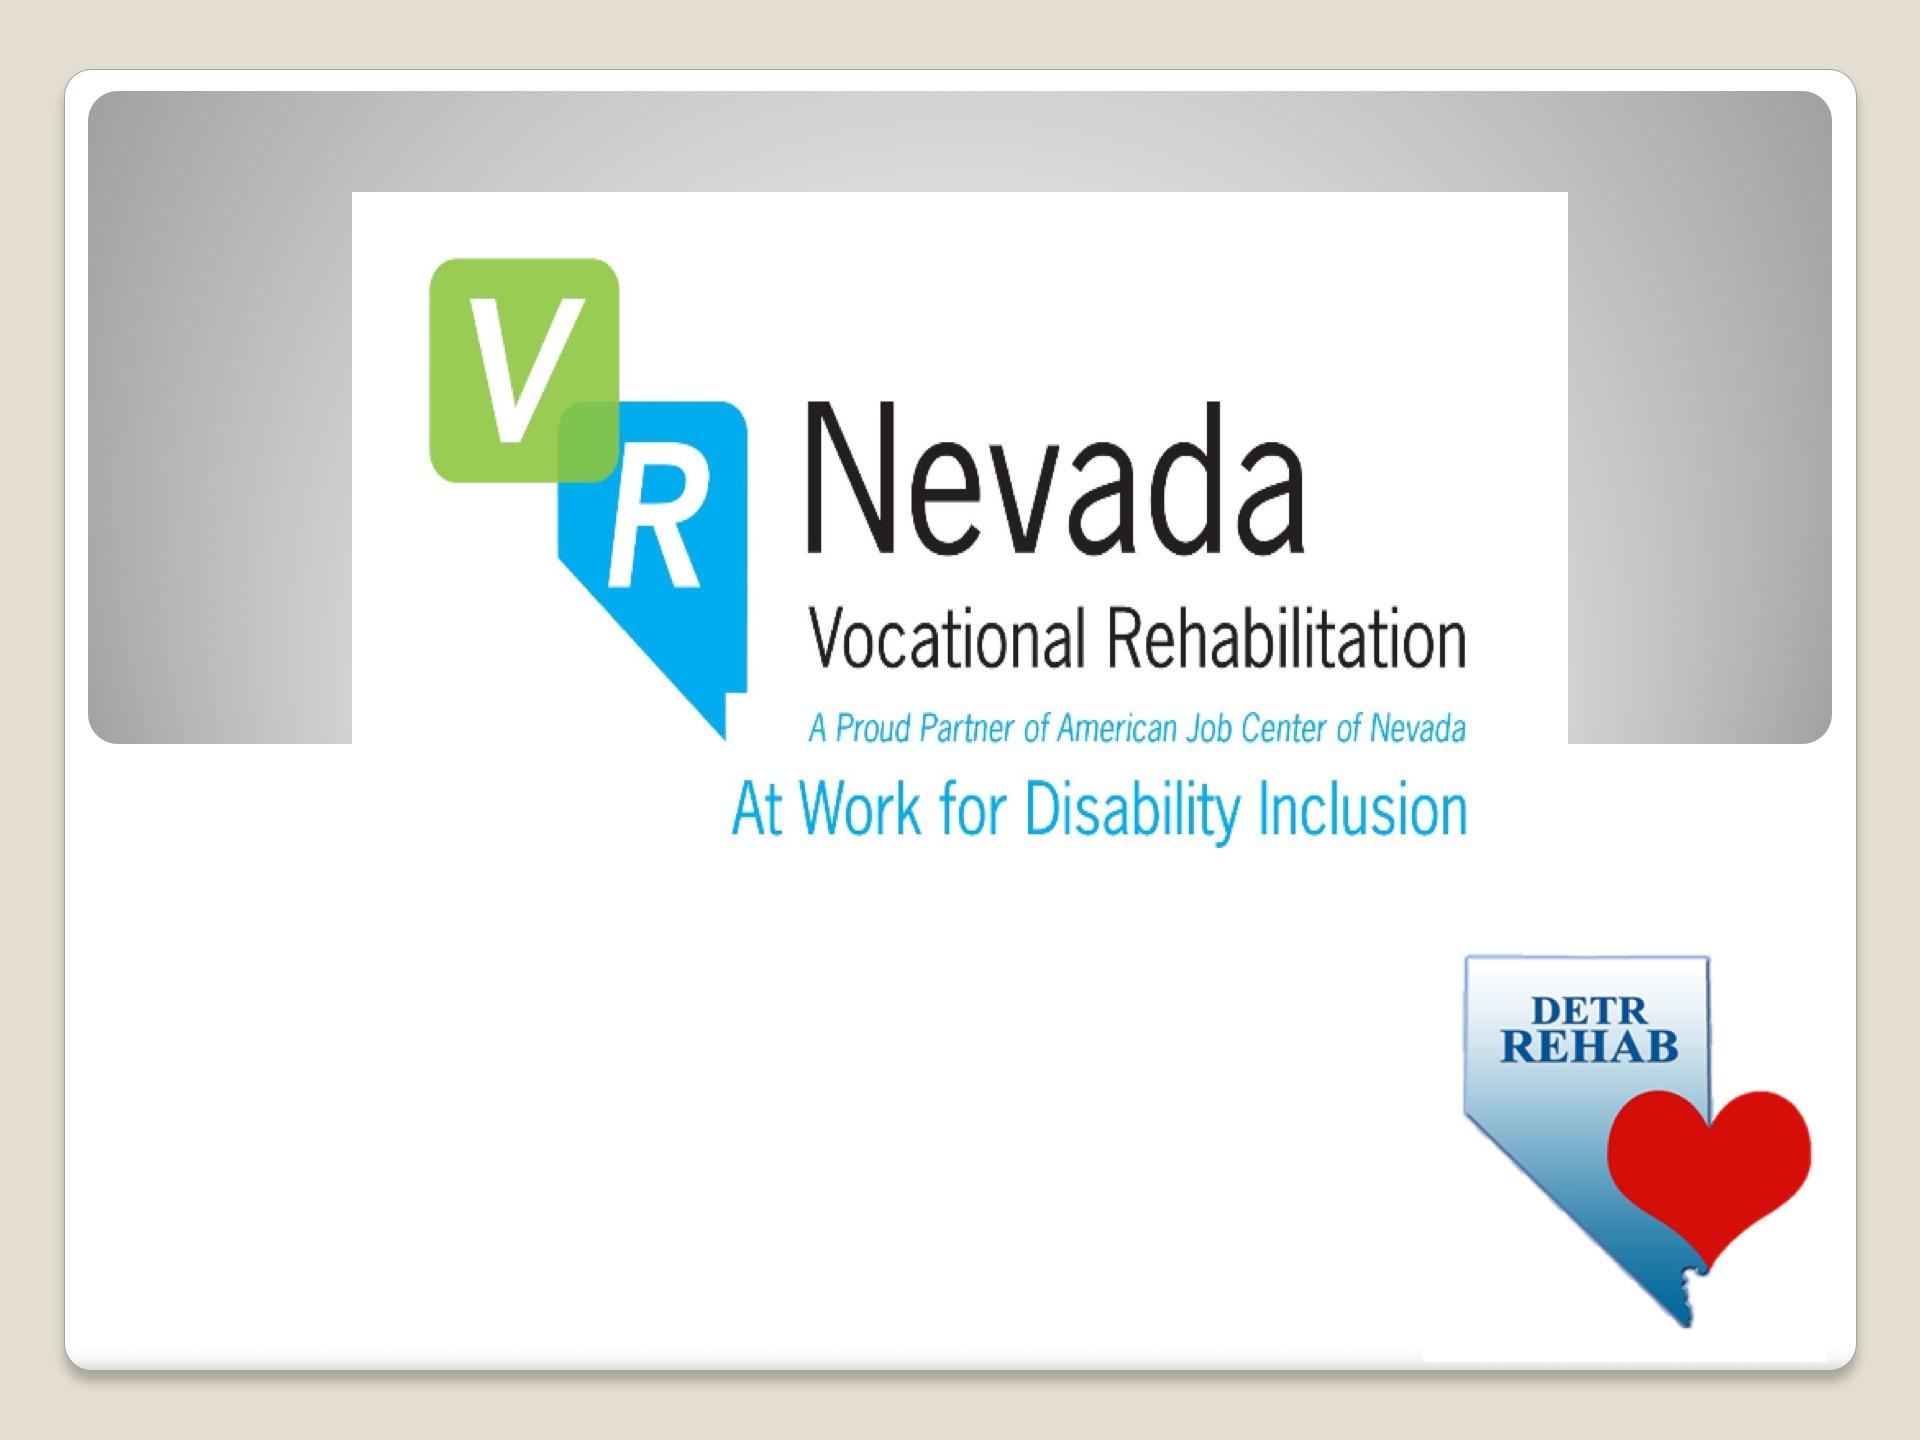 Nevada Vocational Rehabilitation